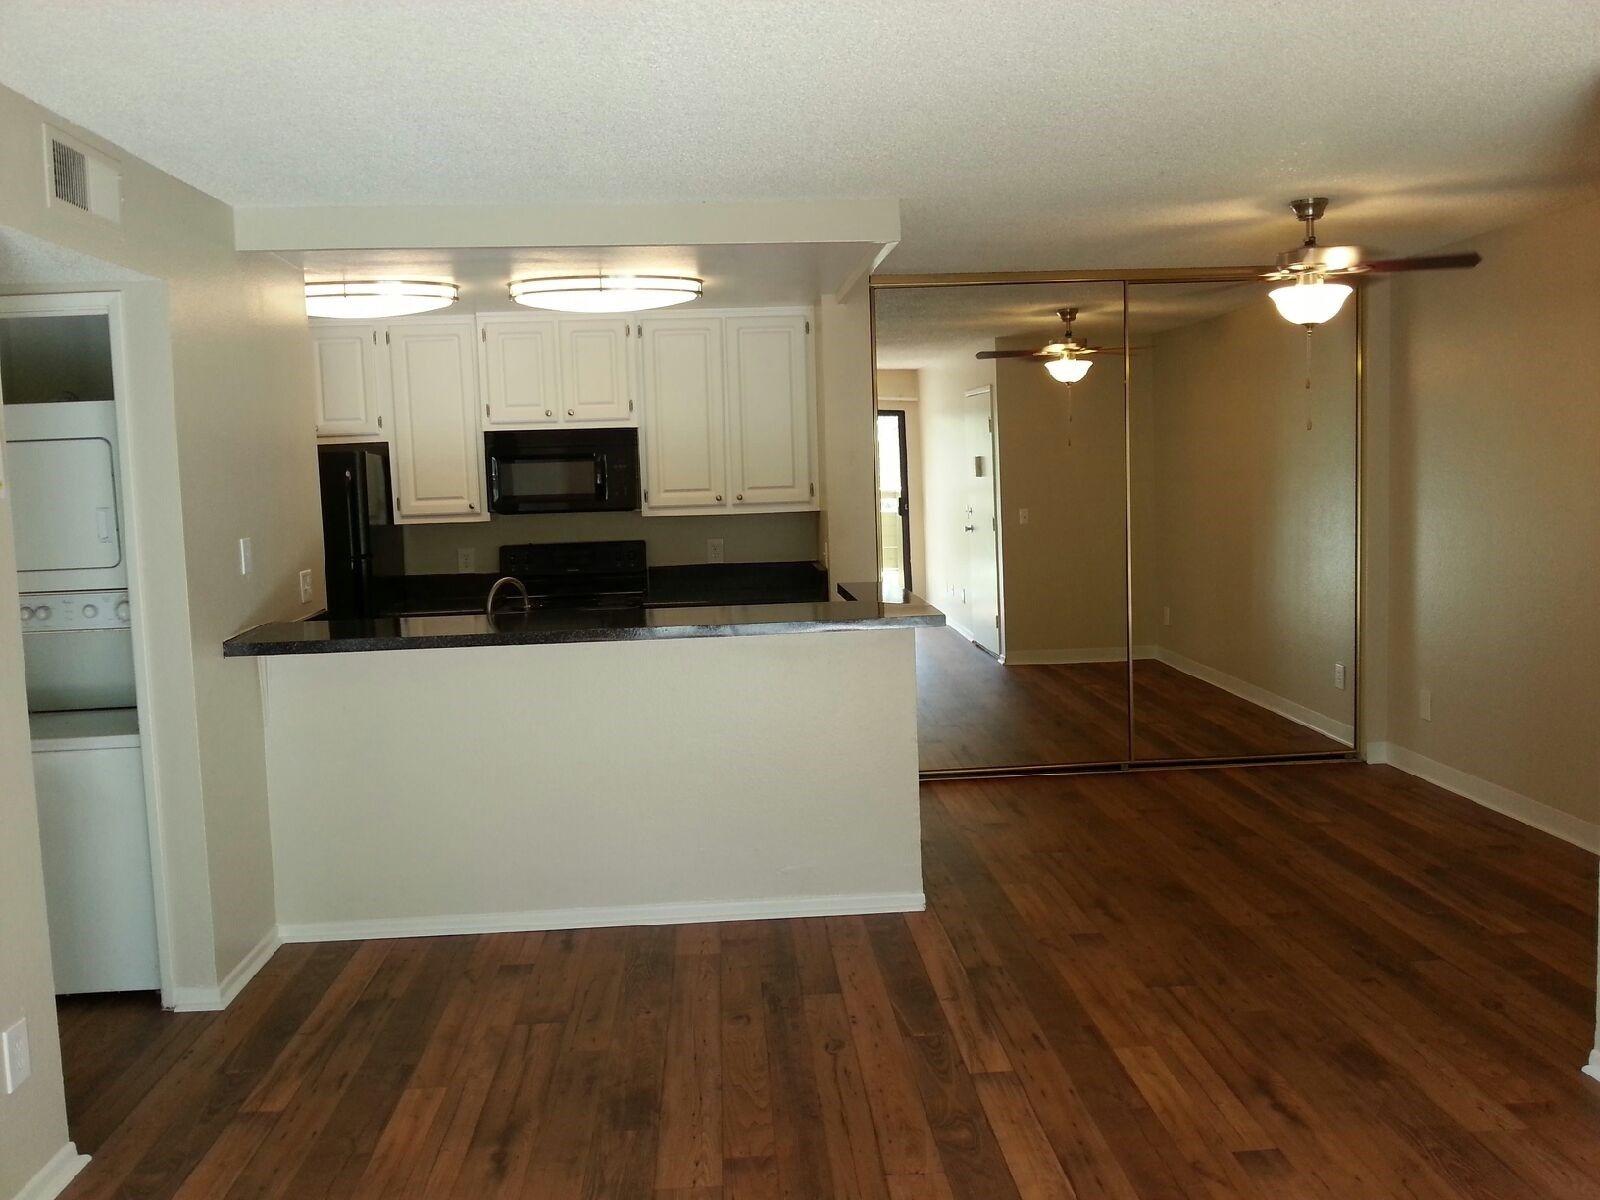 866 729 7226 1 3 Bedroom 1 2 Bath Presidio At Rancho Del Oro 4401 Mission Avenue Oceanside Ca 92 Apartments For Rent Apartment Communities Home Decor